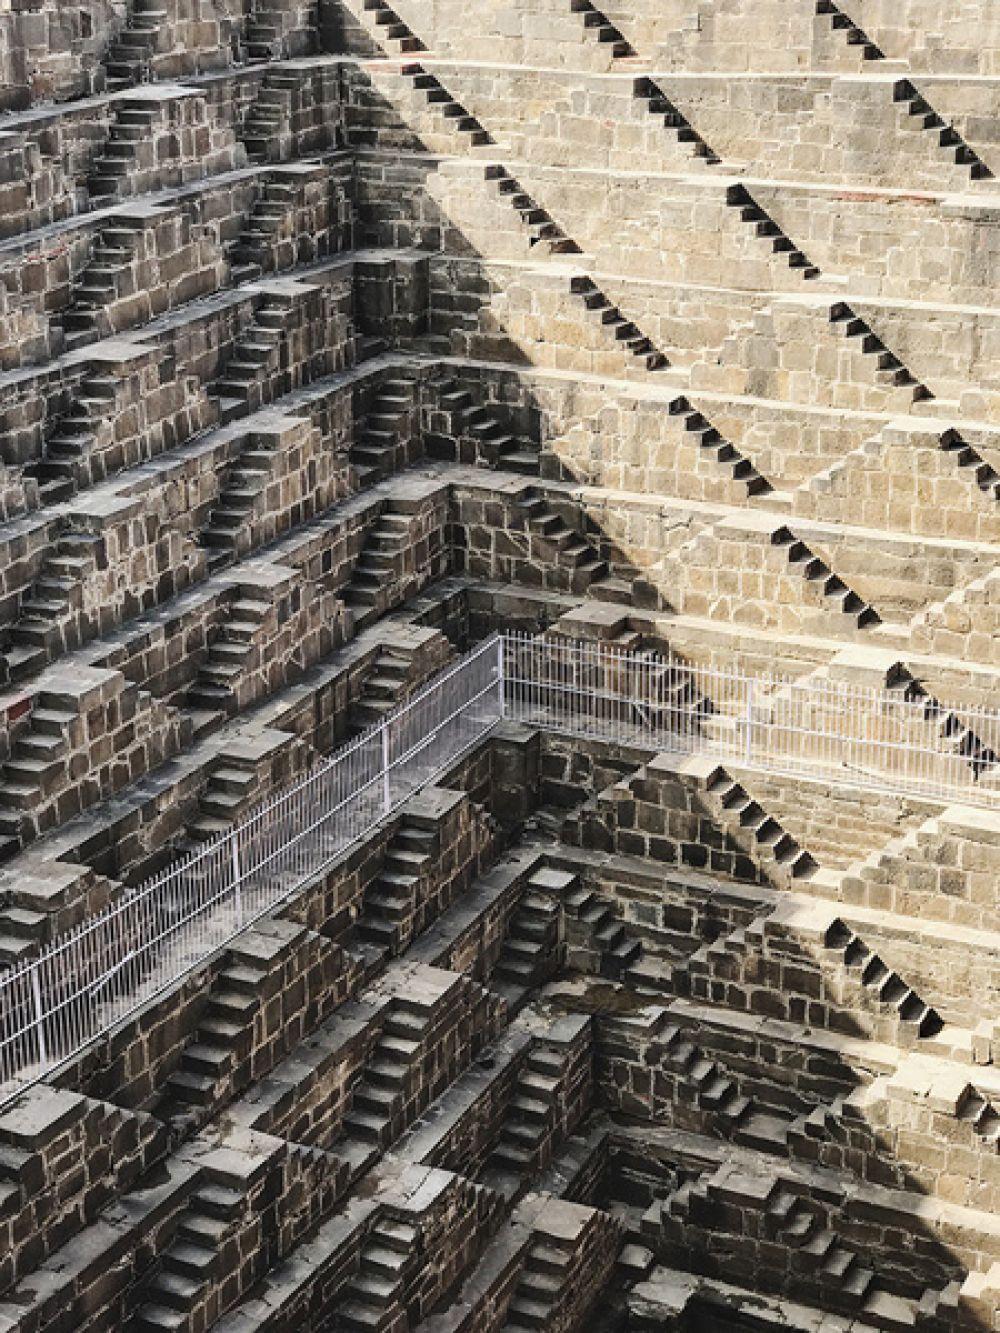 1 место в категории «Архитектура» — Ступенчатый колодец Чанд Баори, Раджастхан, Индия.